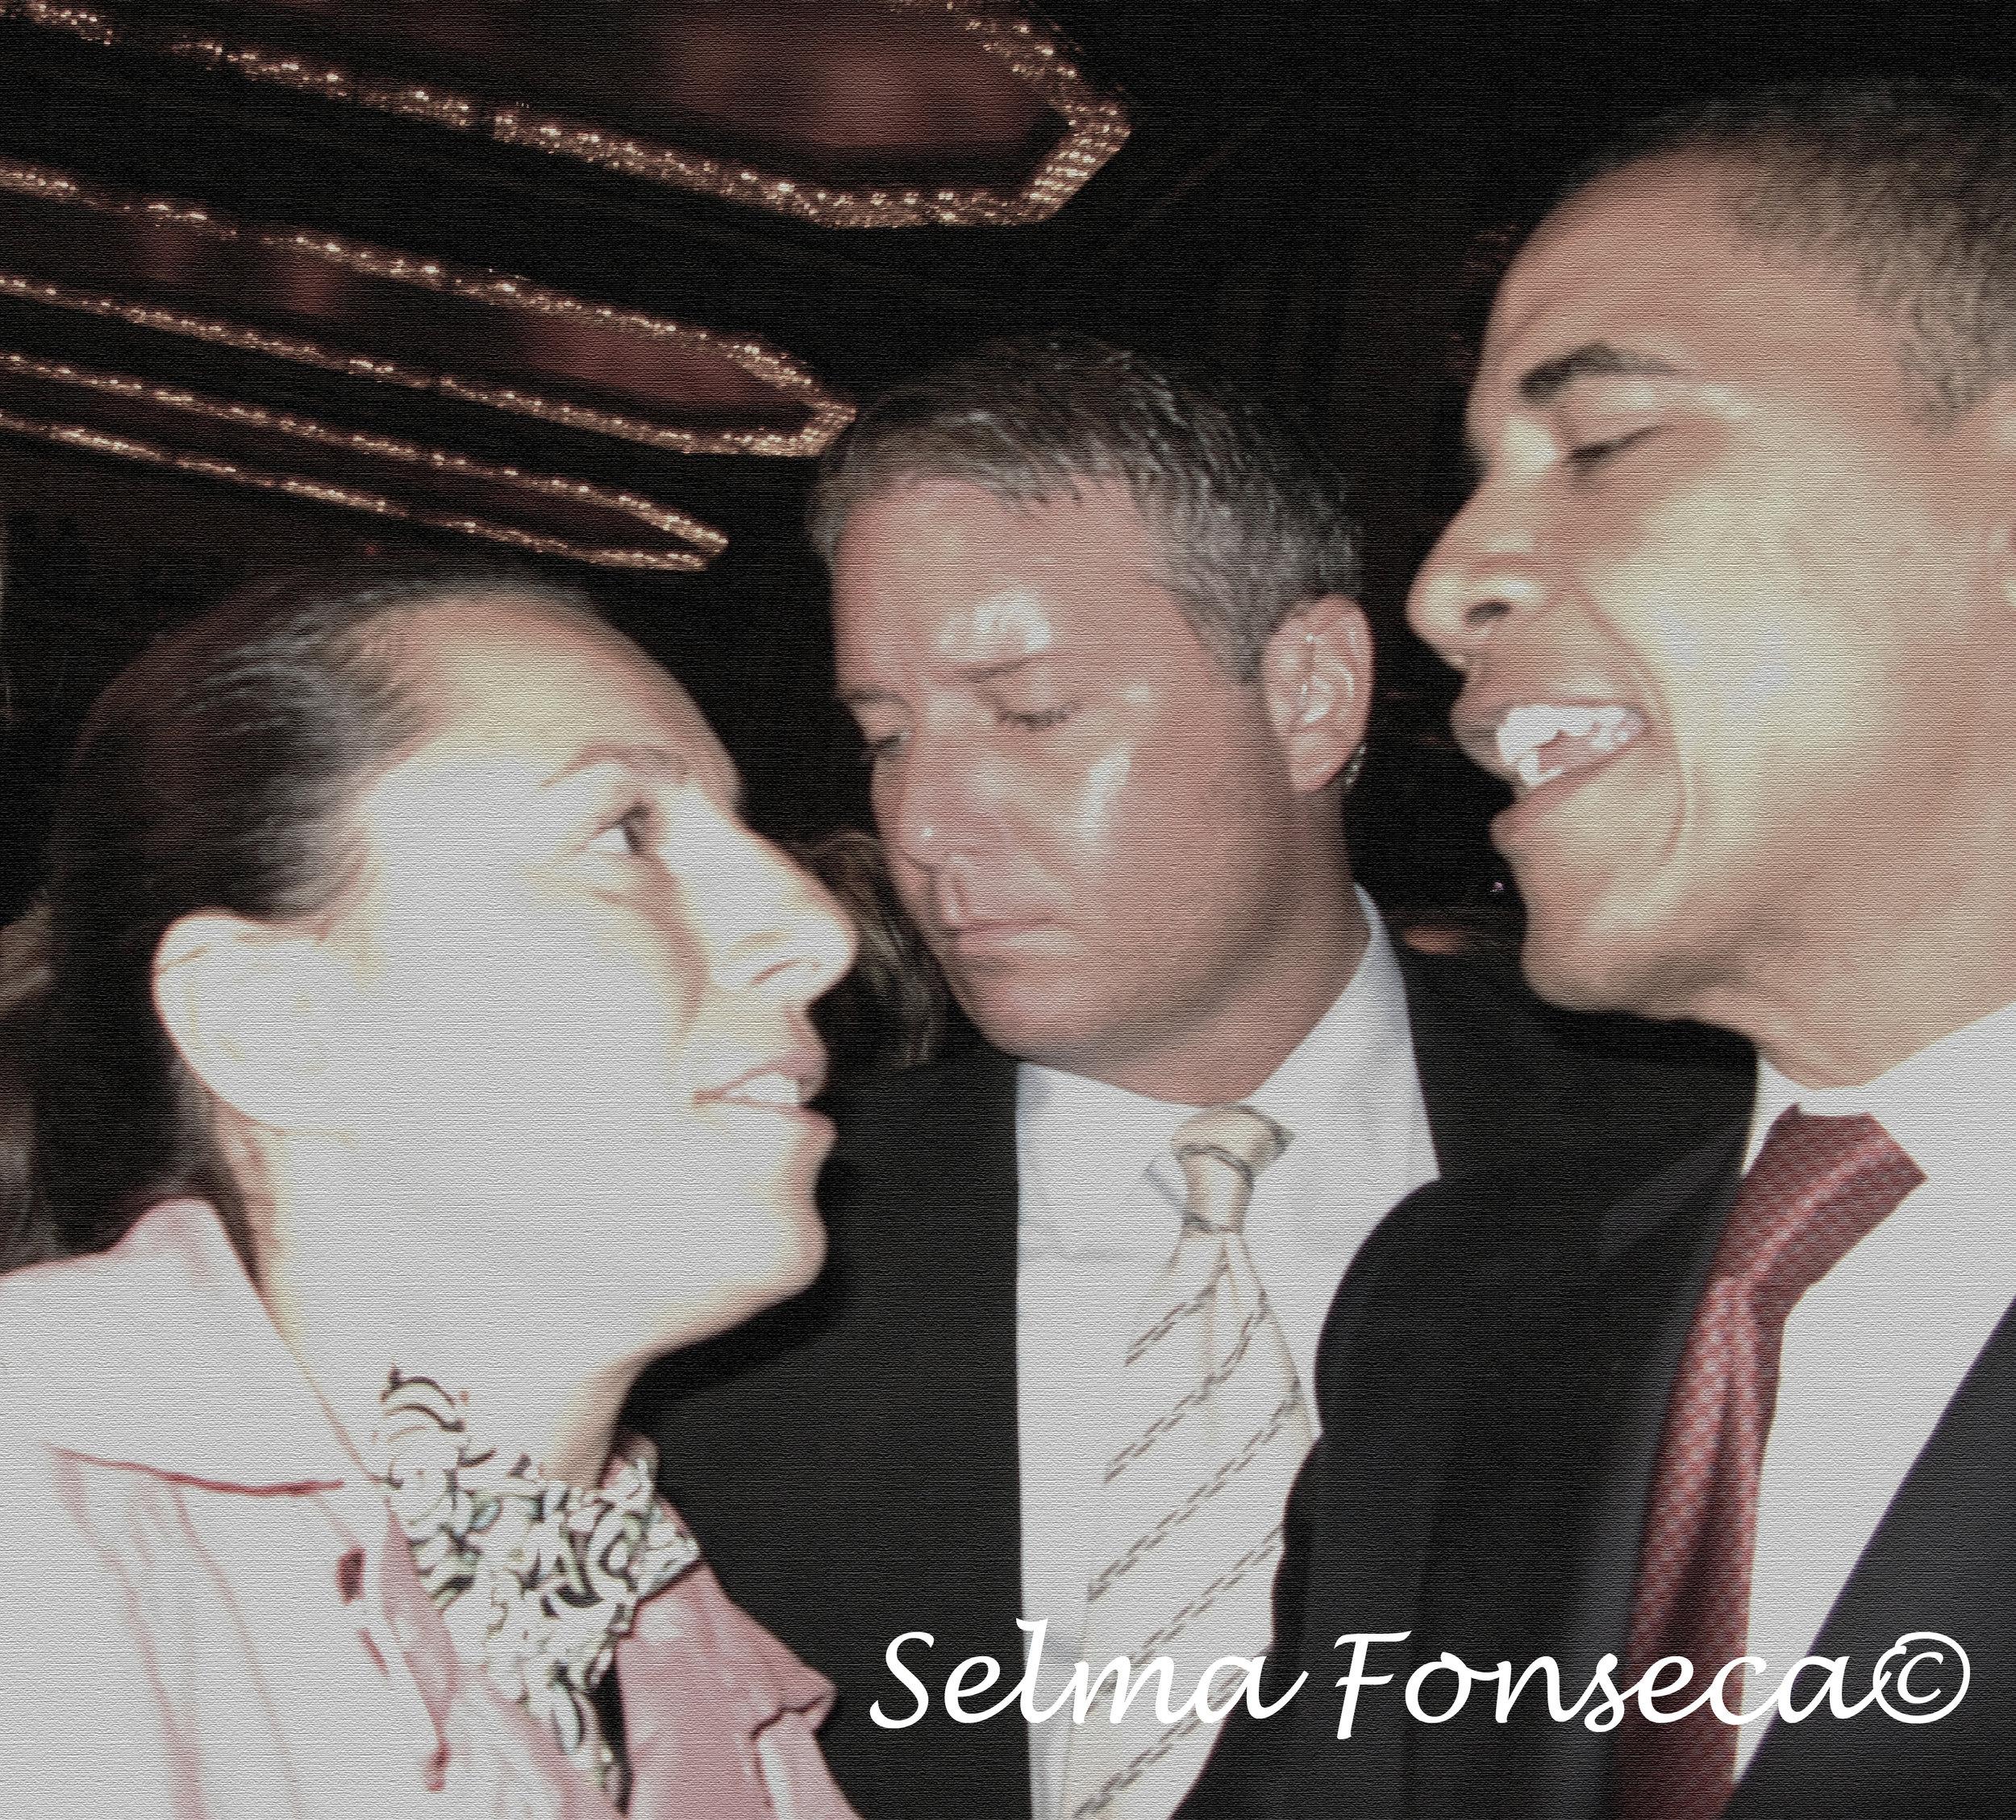 Barack Obama Selma Fonseca.jpg